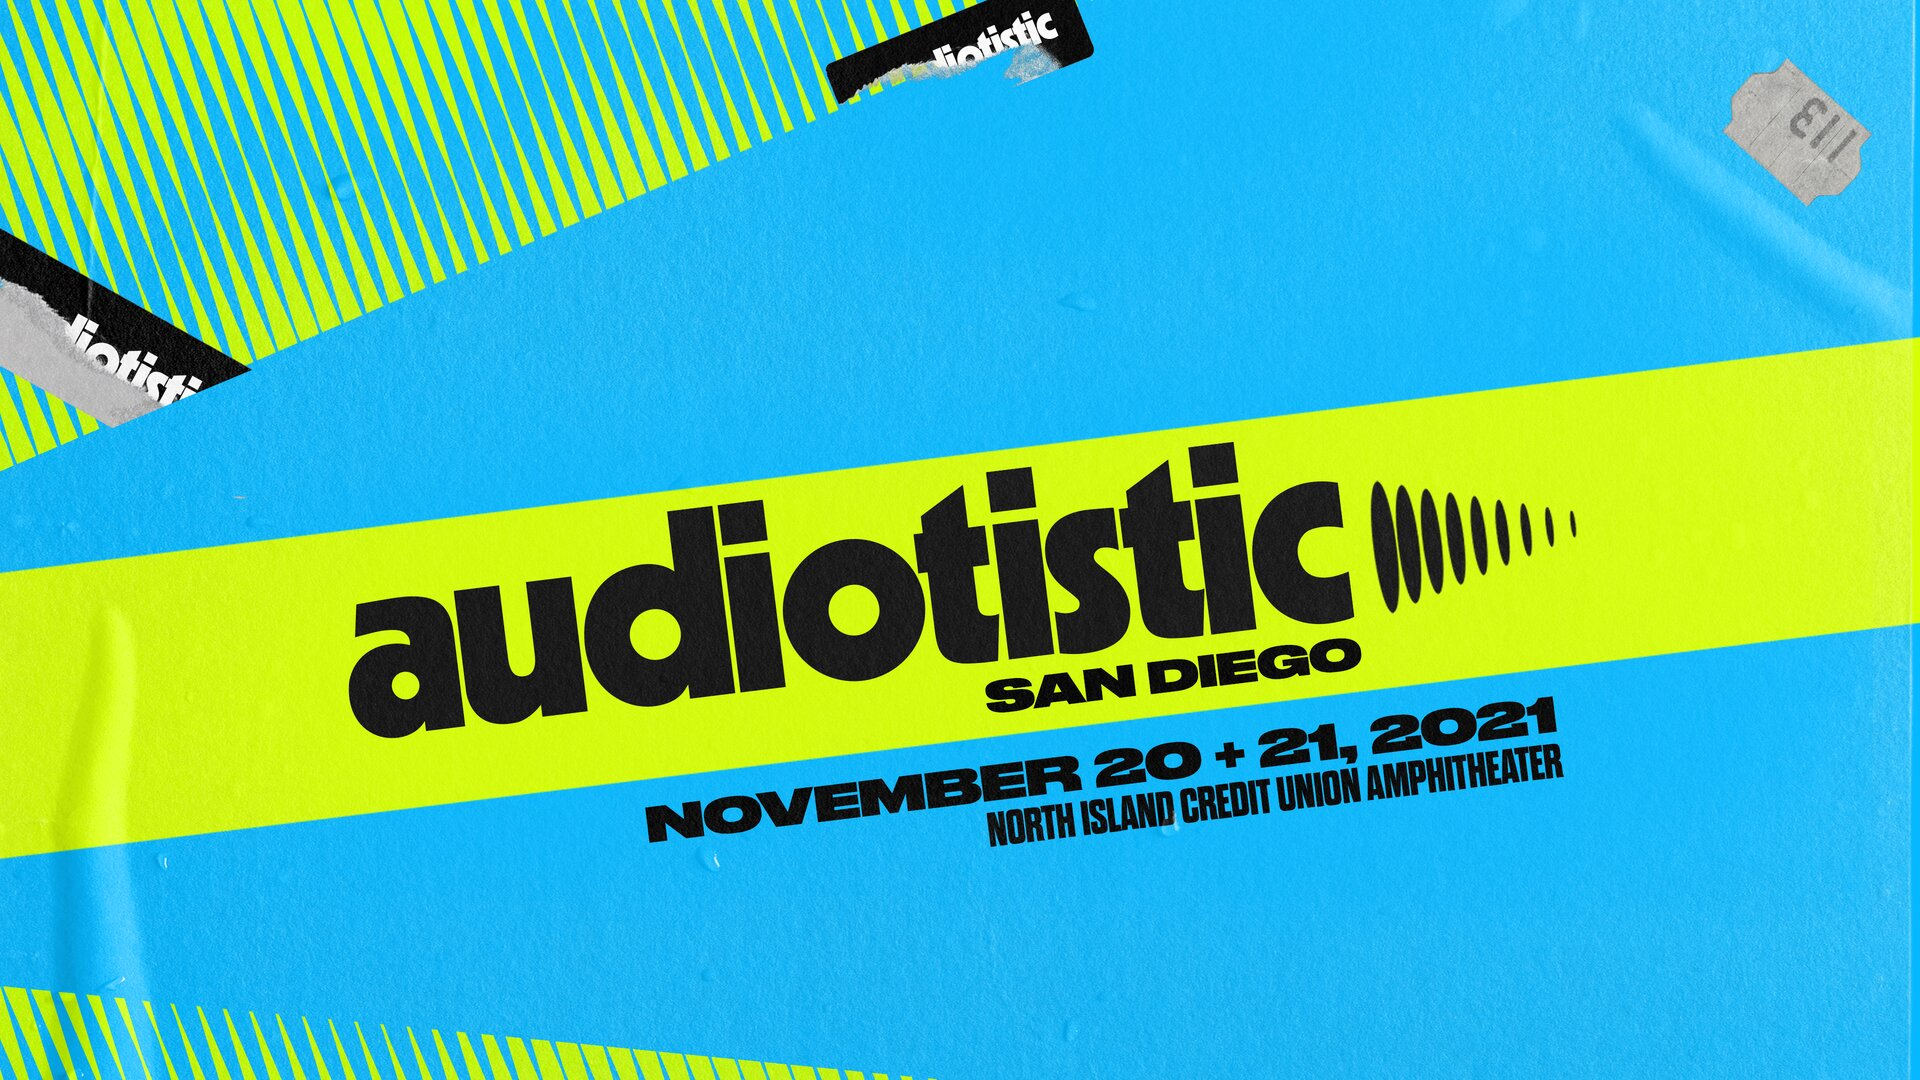 Audiotistic San Diego Locker Rental 2021